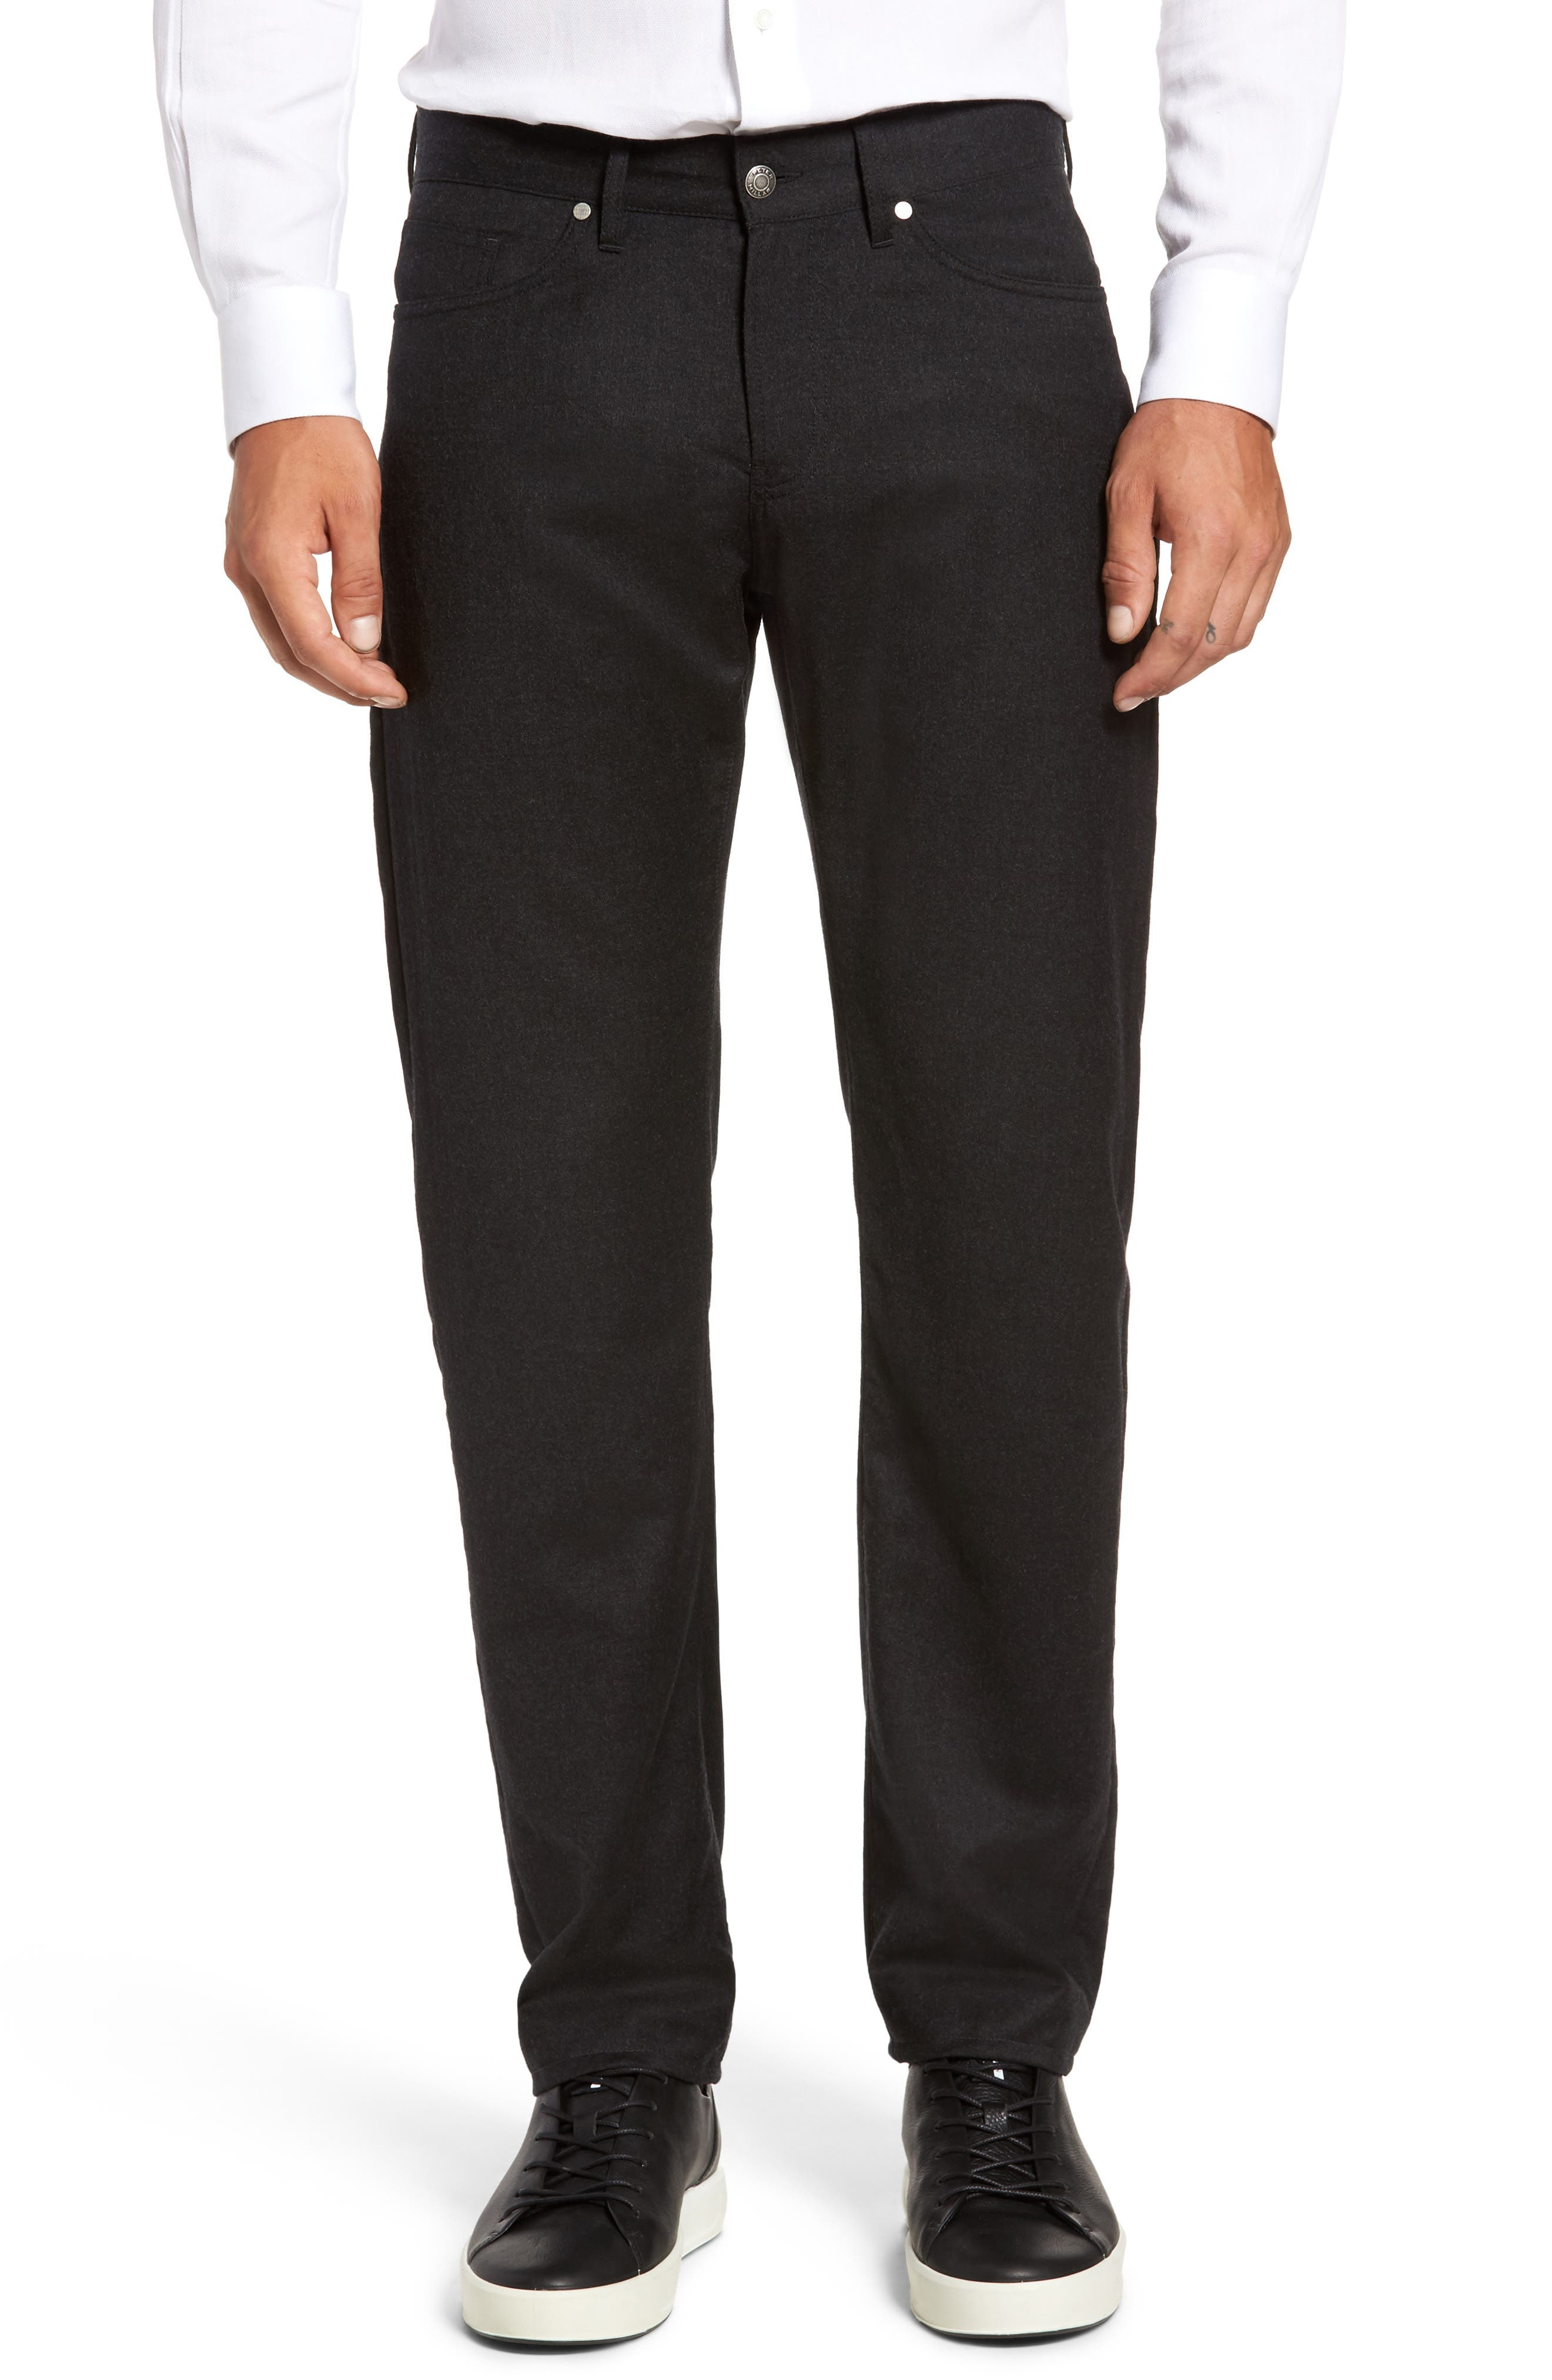 Peter Millar Wintertime Flannel Five-Pocket Pants (Regular & Big)